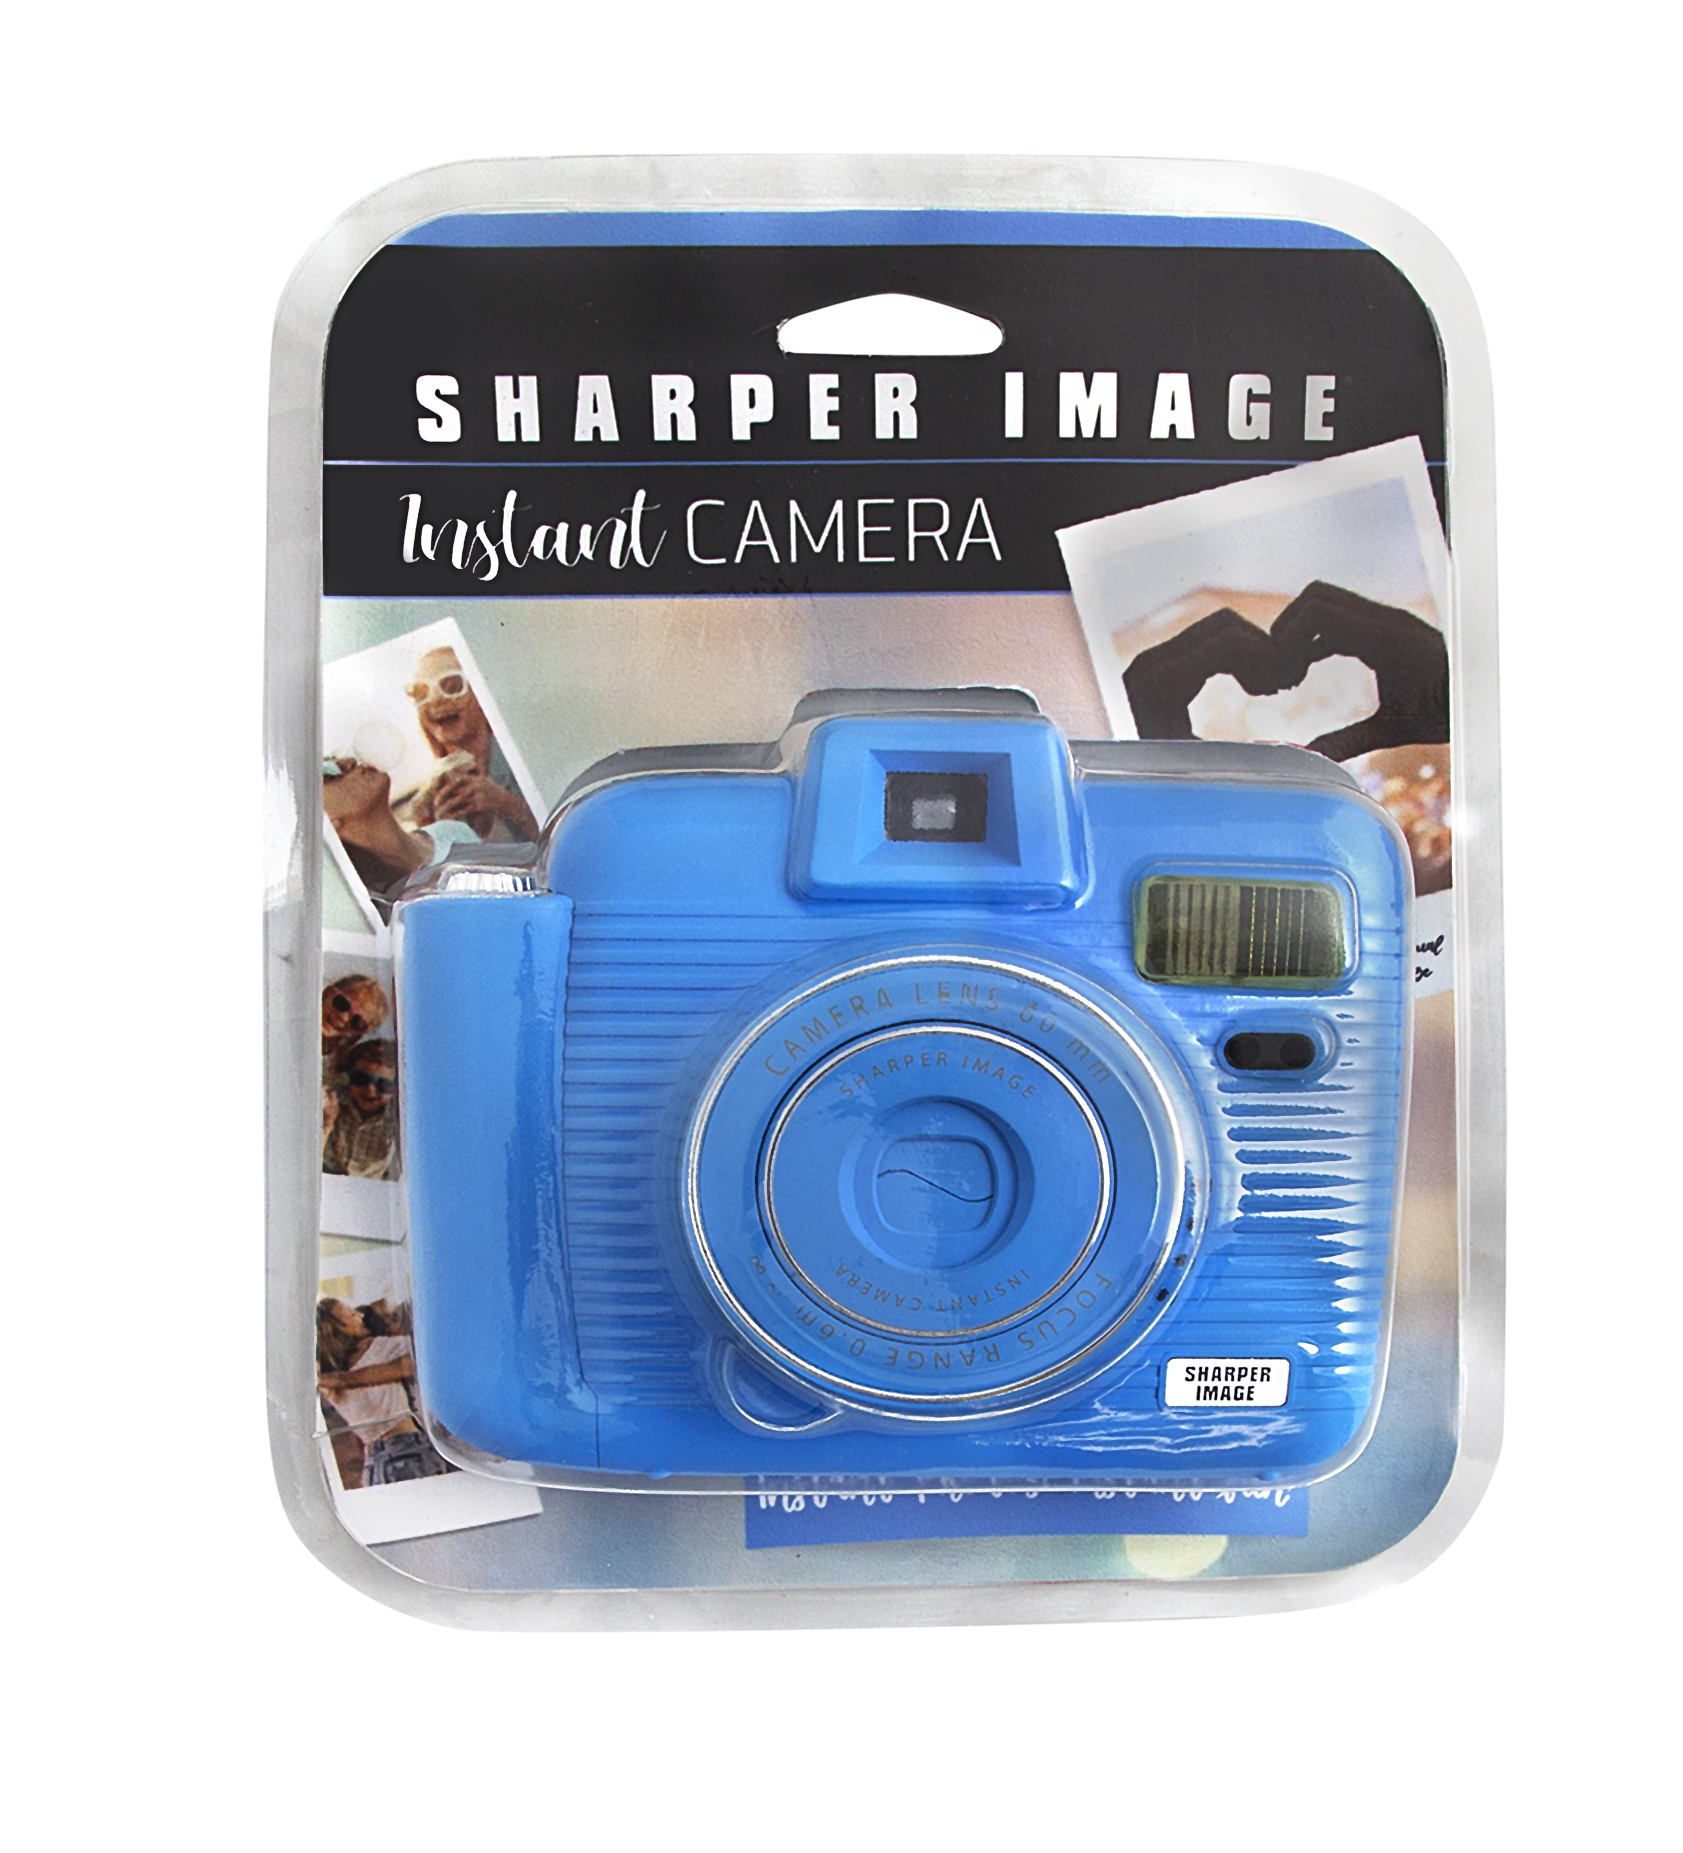 Sharper Image Instant Camera